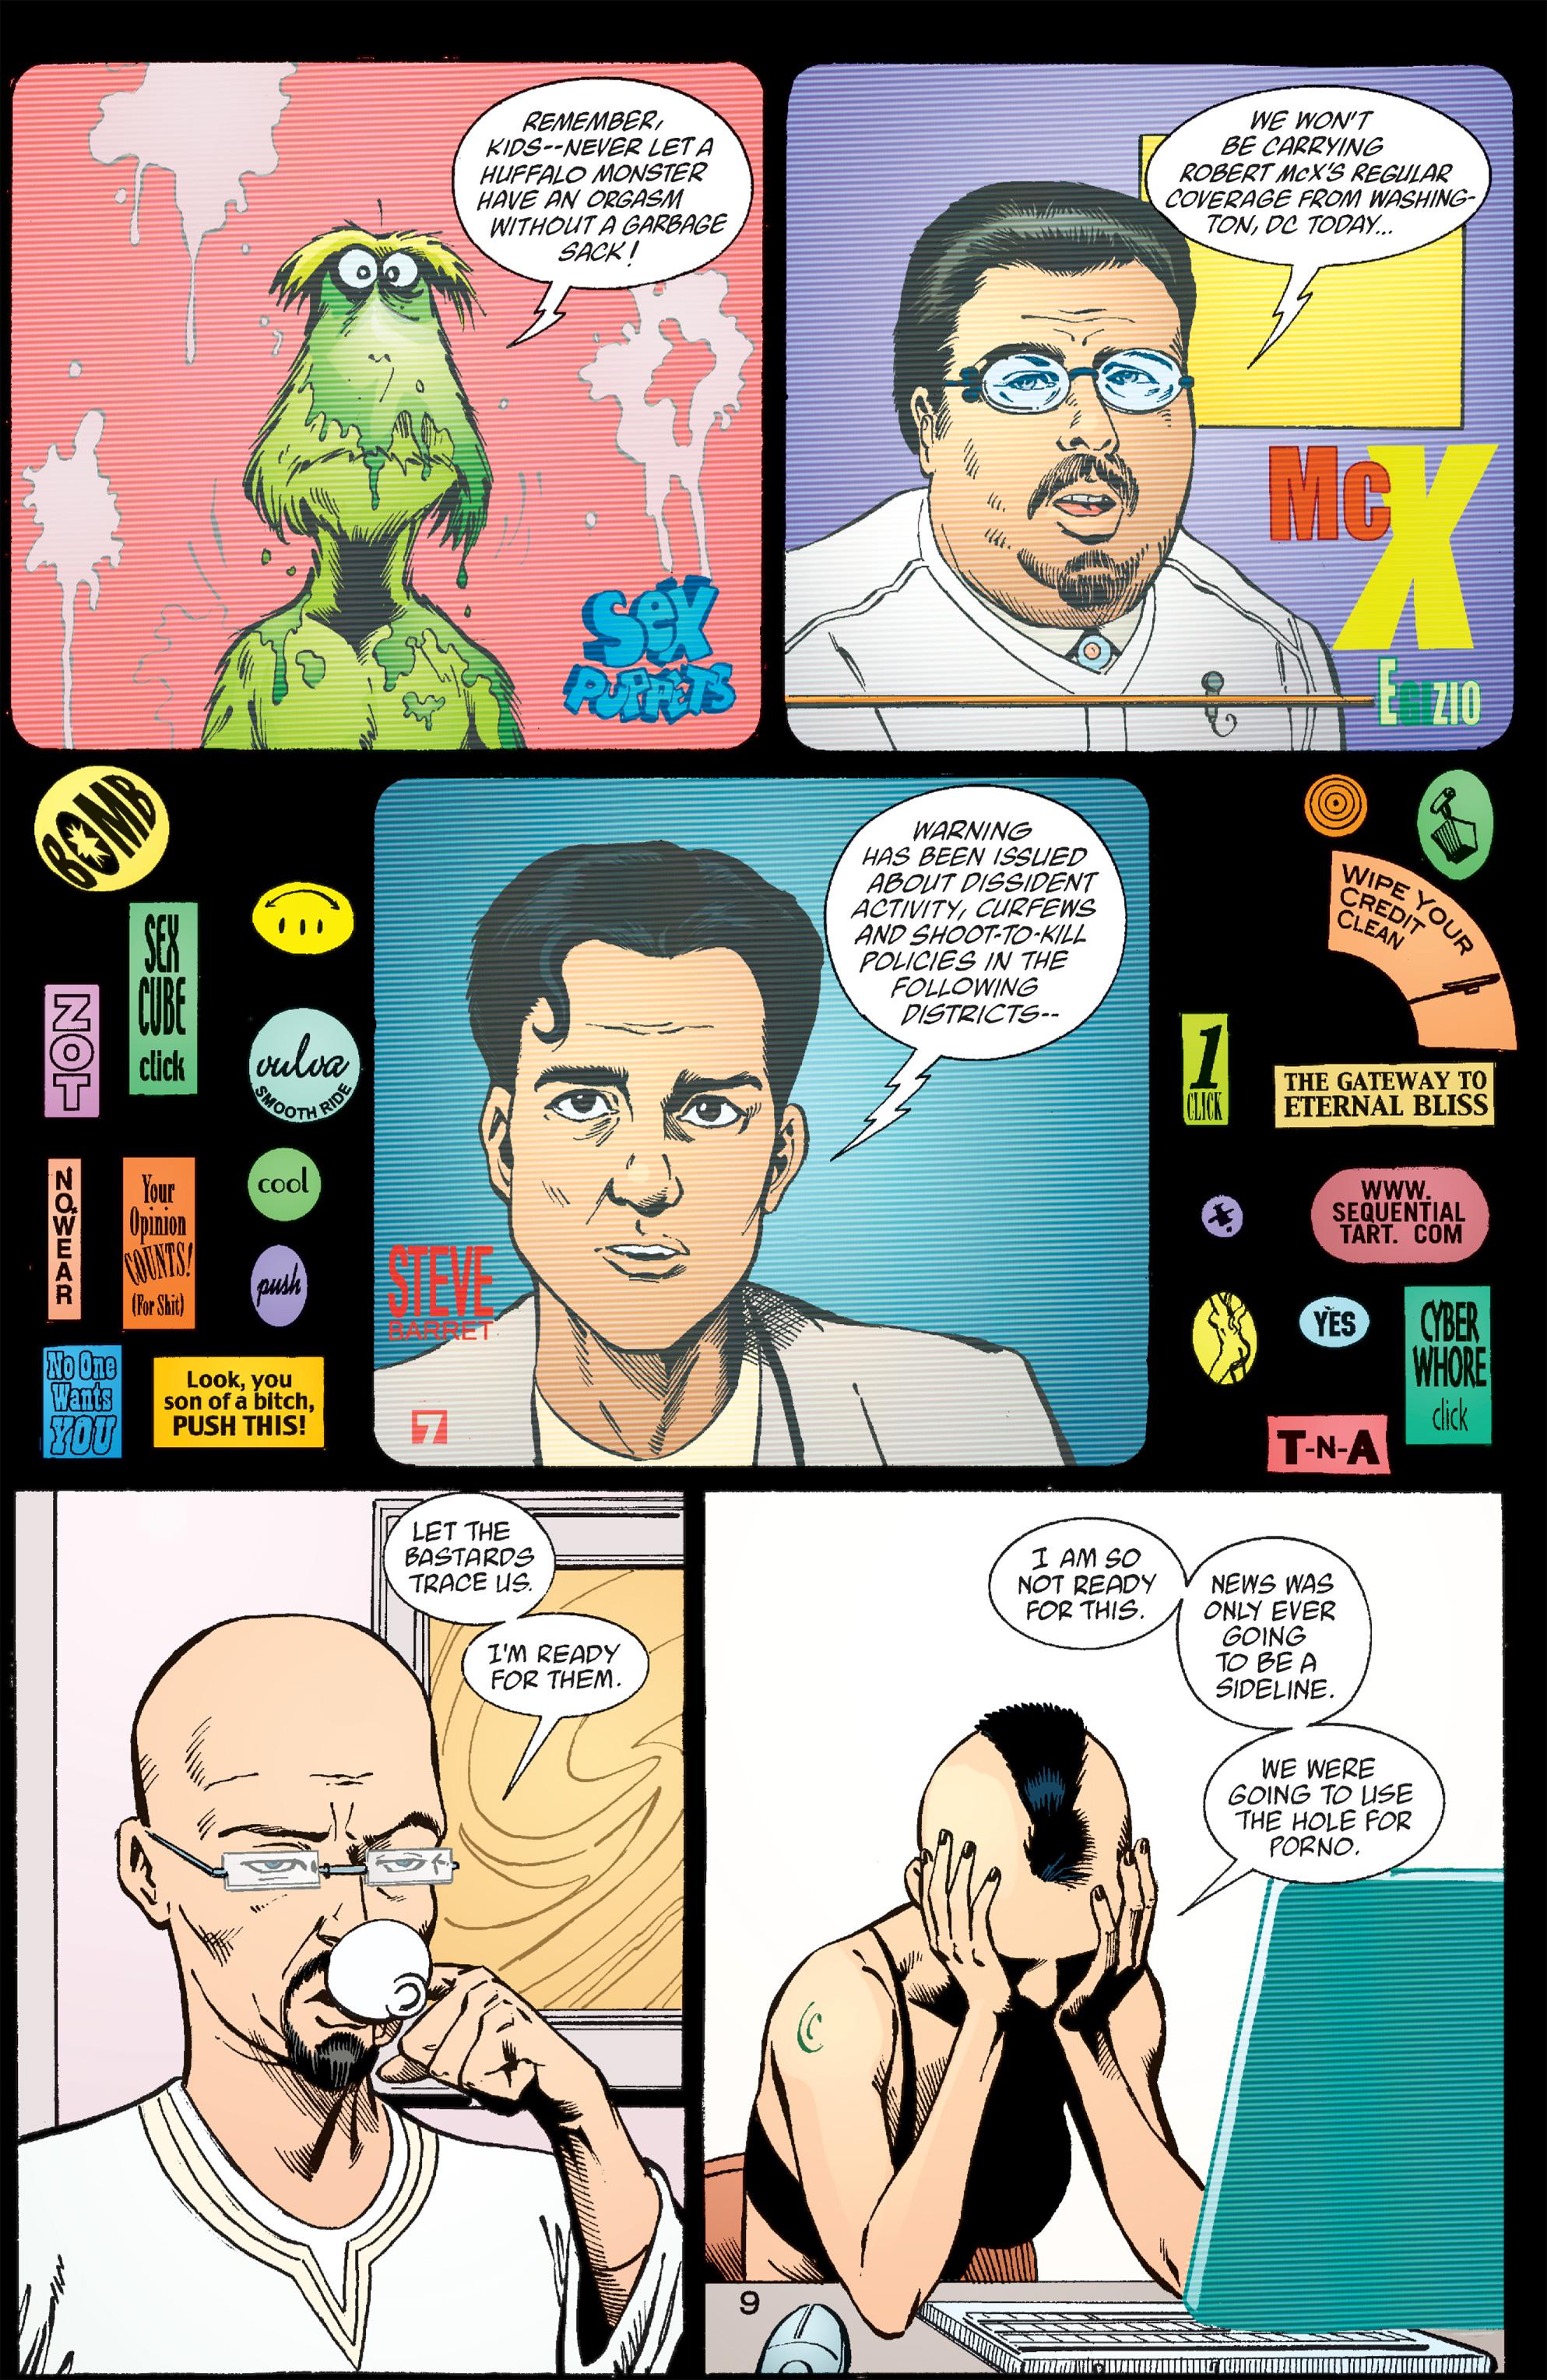 Read online Transmetropolitan comic -  Issue #57 - 10